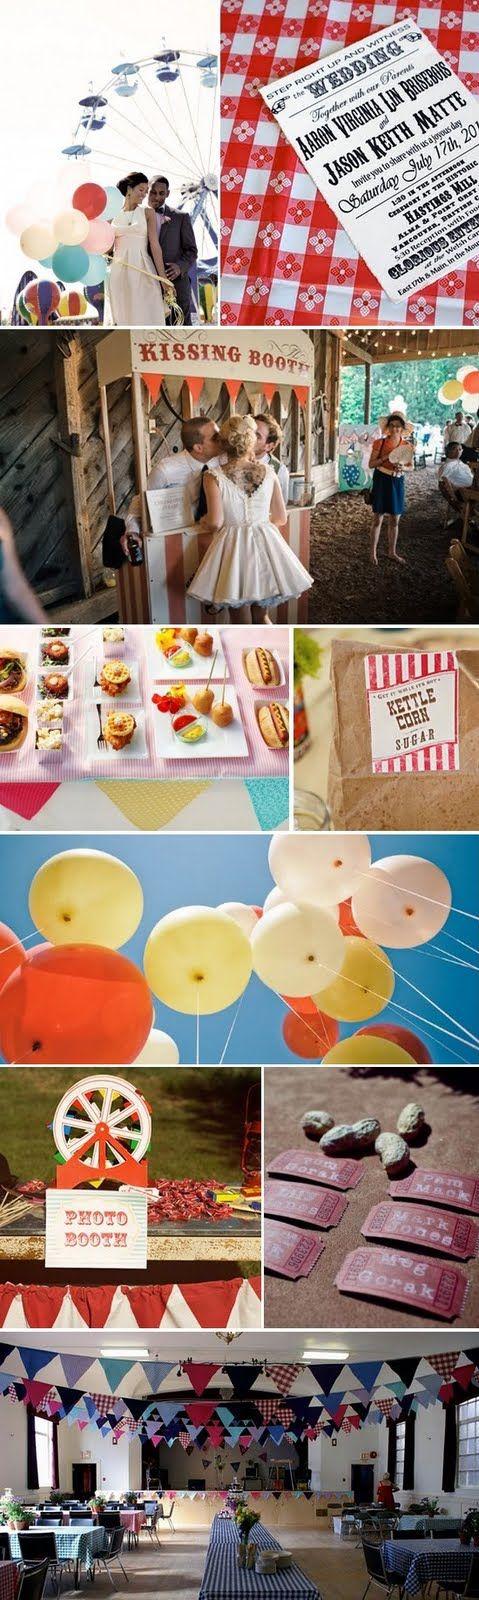 Country fair weddings